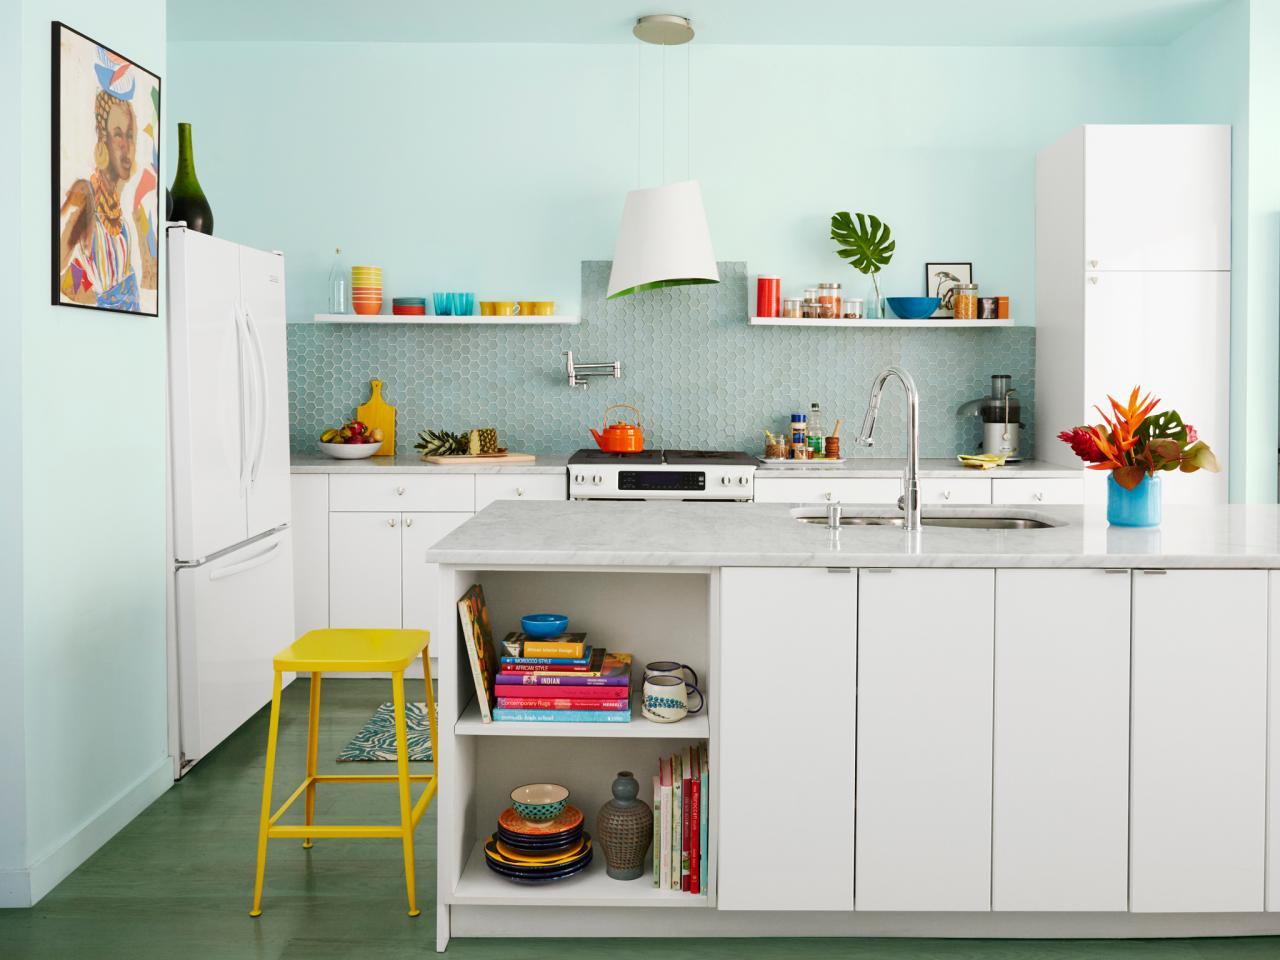 Best Mop For Kitchen Floor Choosing The Right Kitchen Floor Material Hgtv